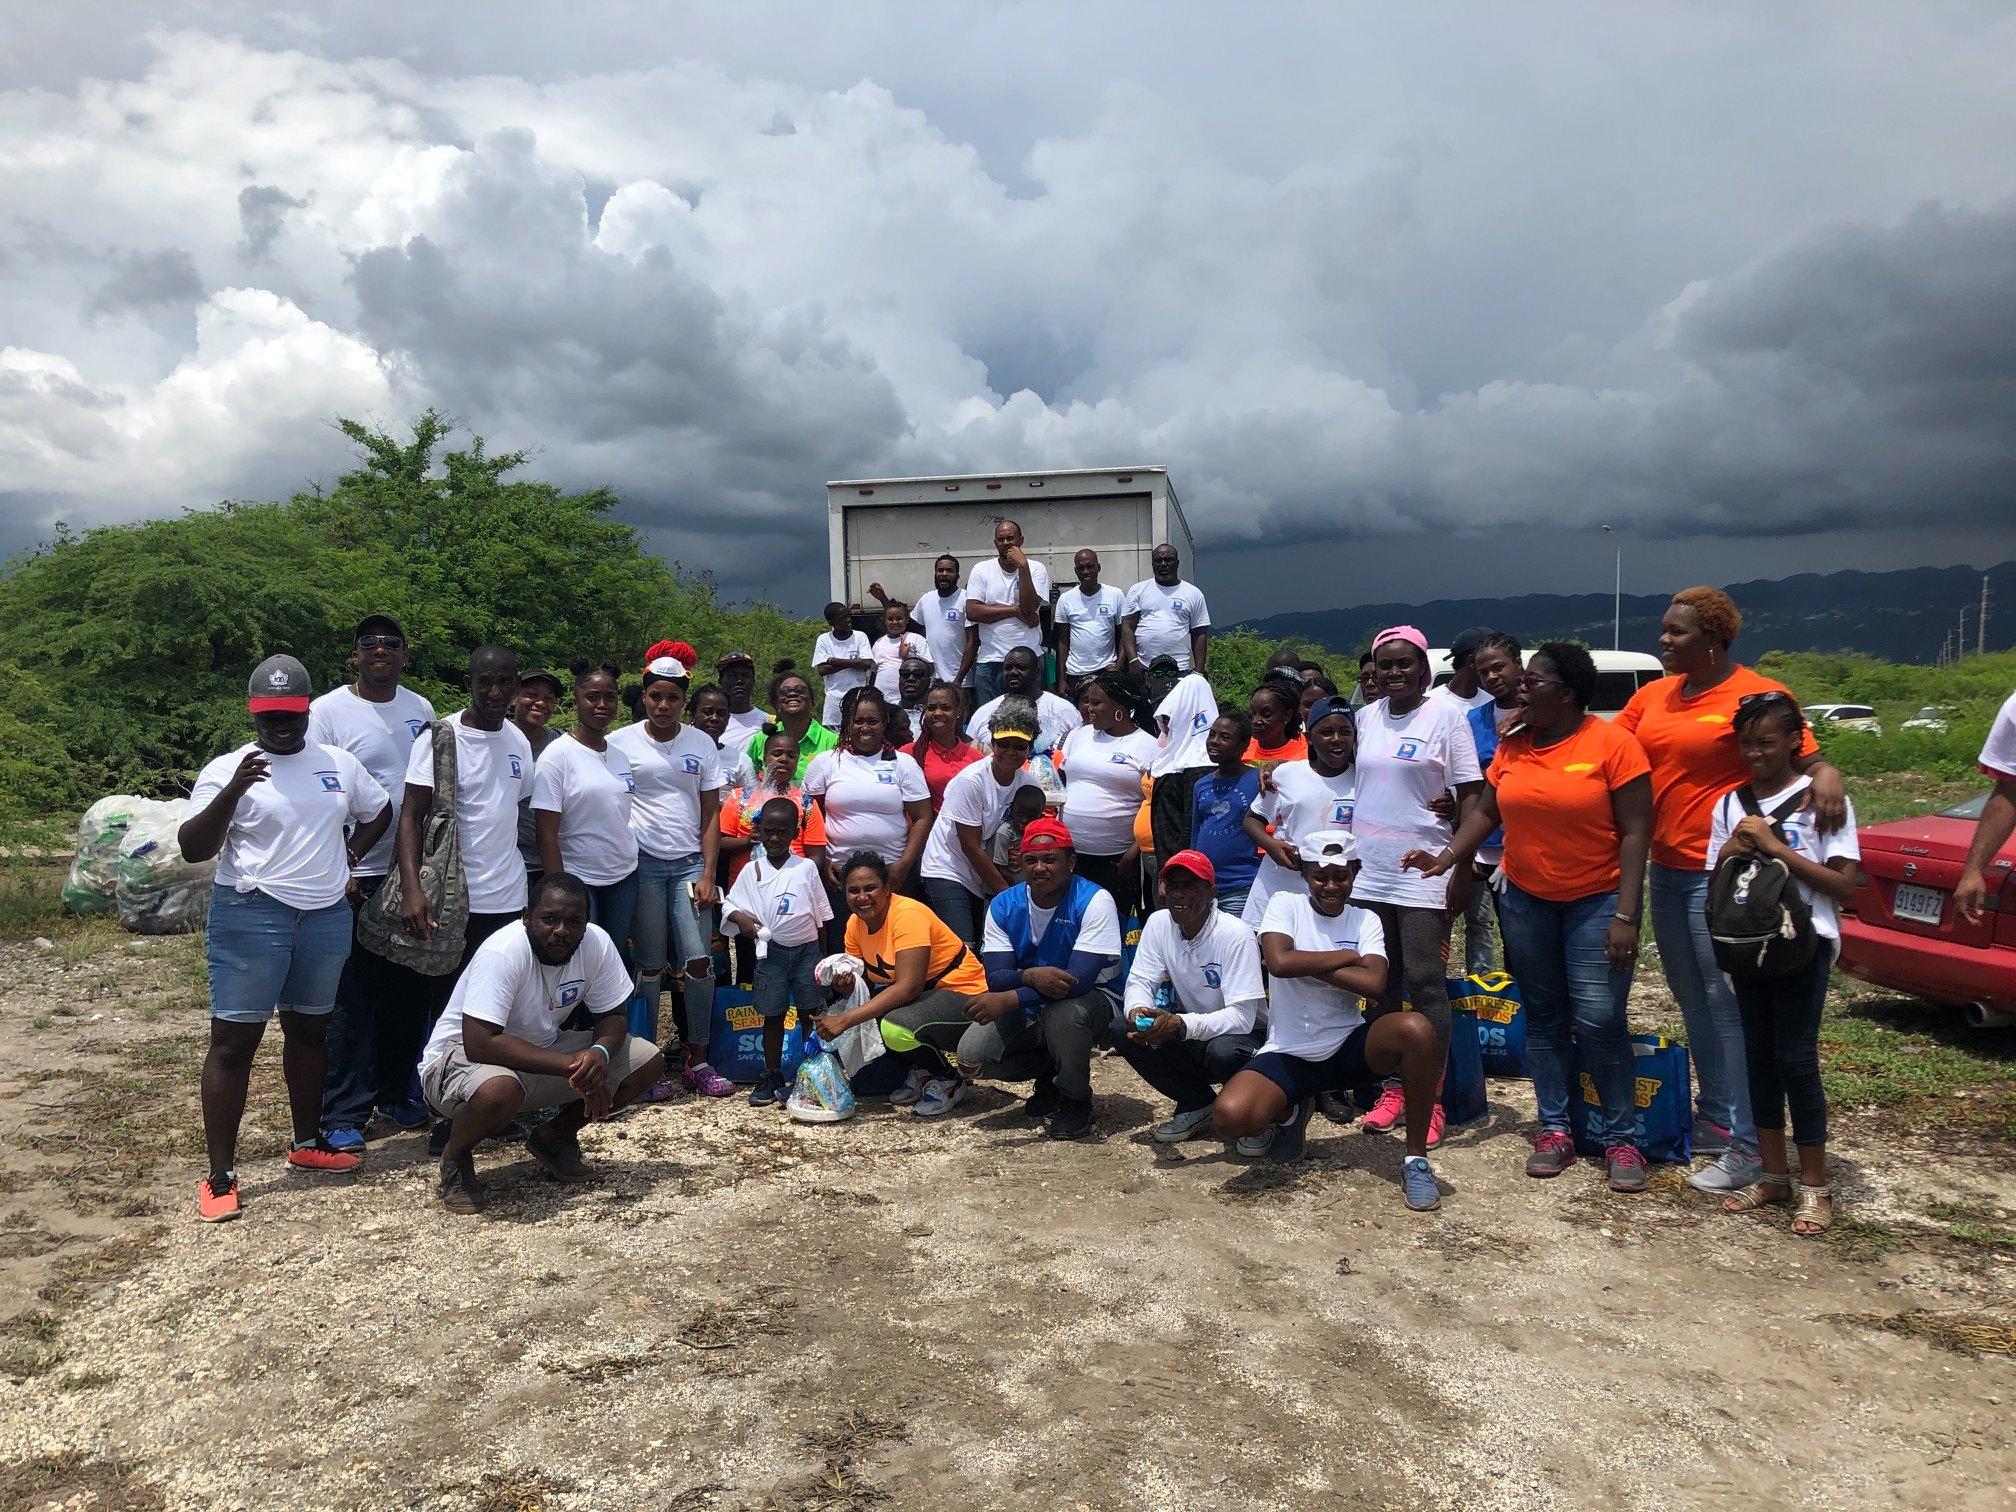 ICC-Day-2019-KFTL-Coastline-5.jpg